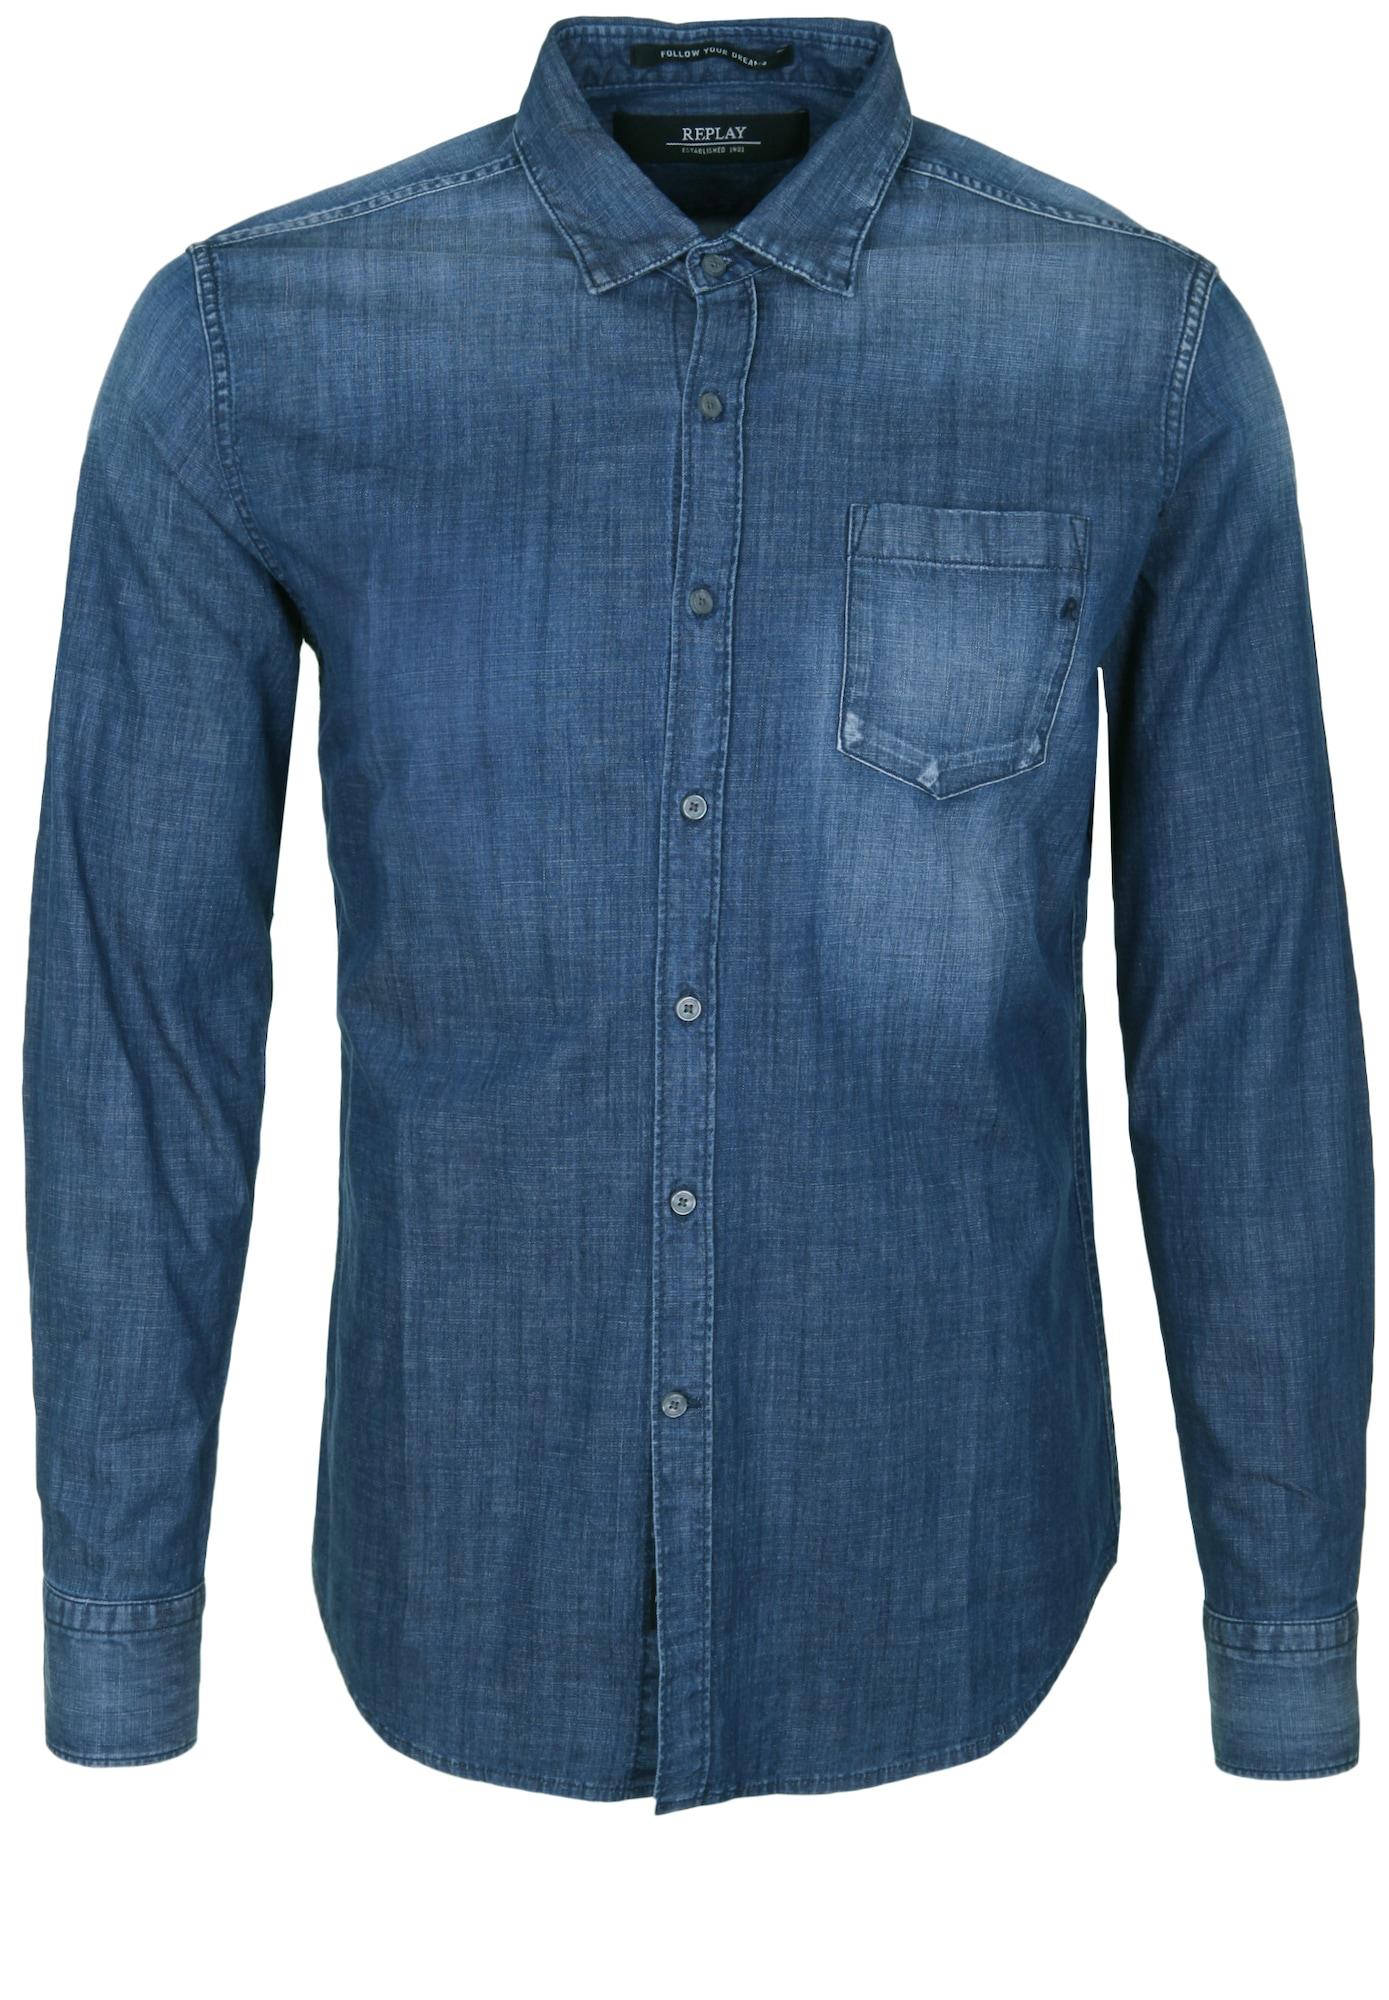 Jeanshemd | Bekleidung > Hemden > Jeanshemden | Replay